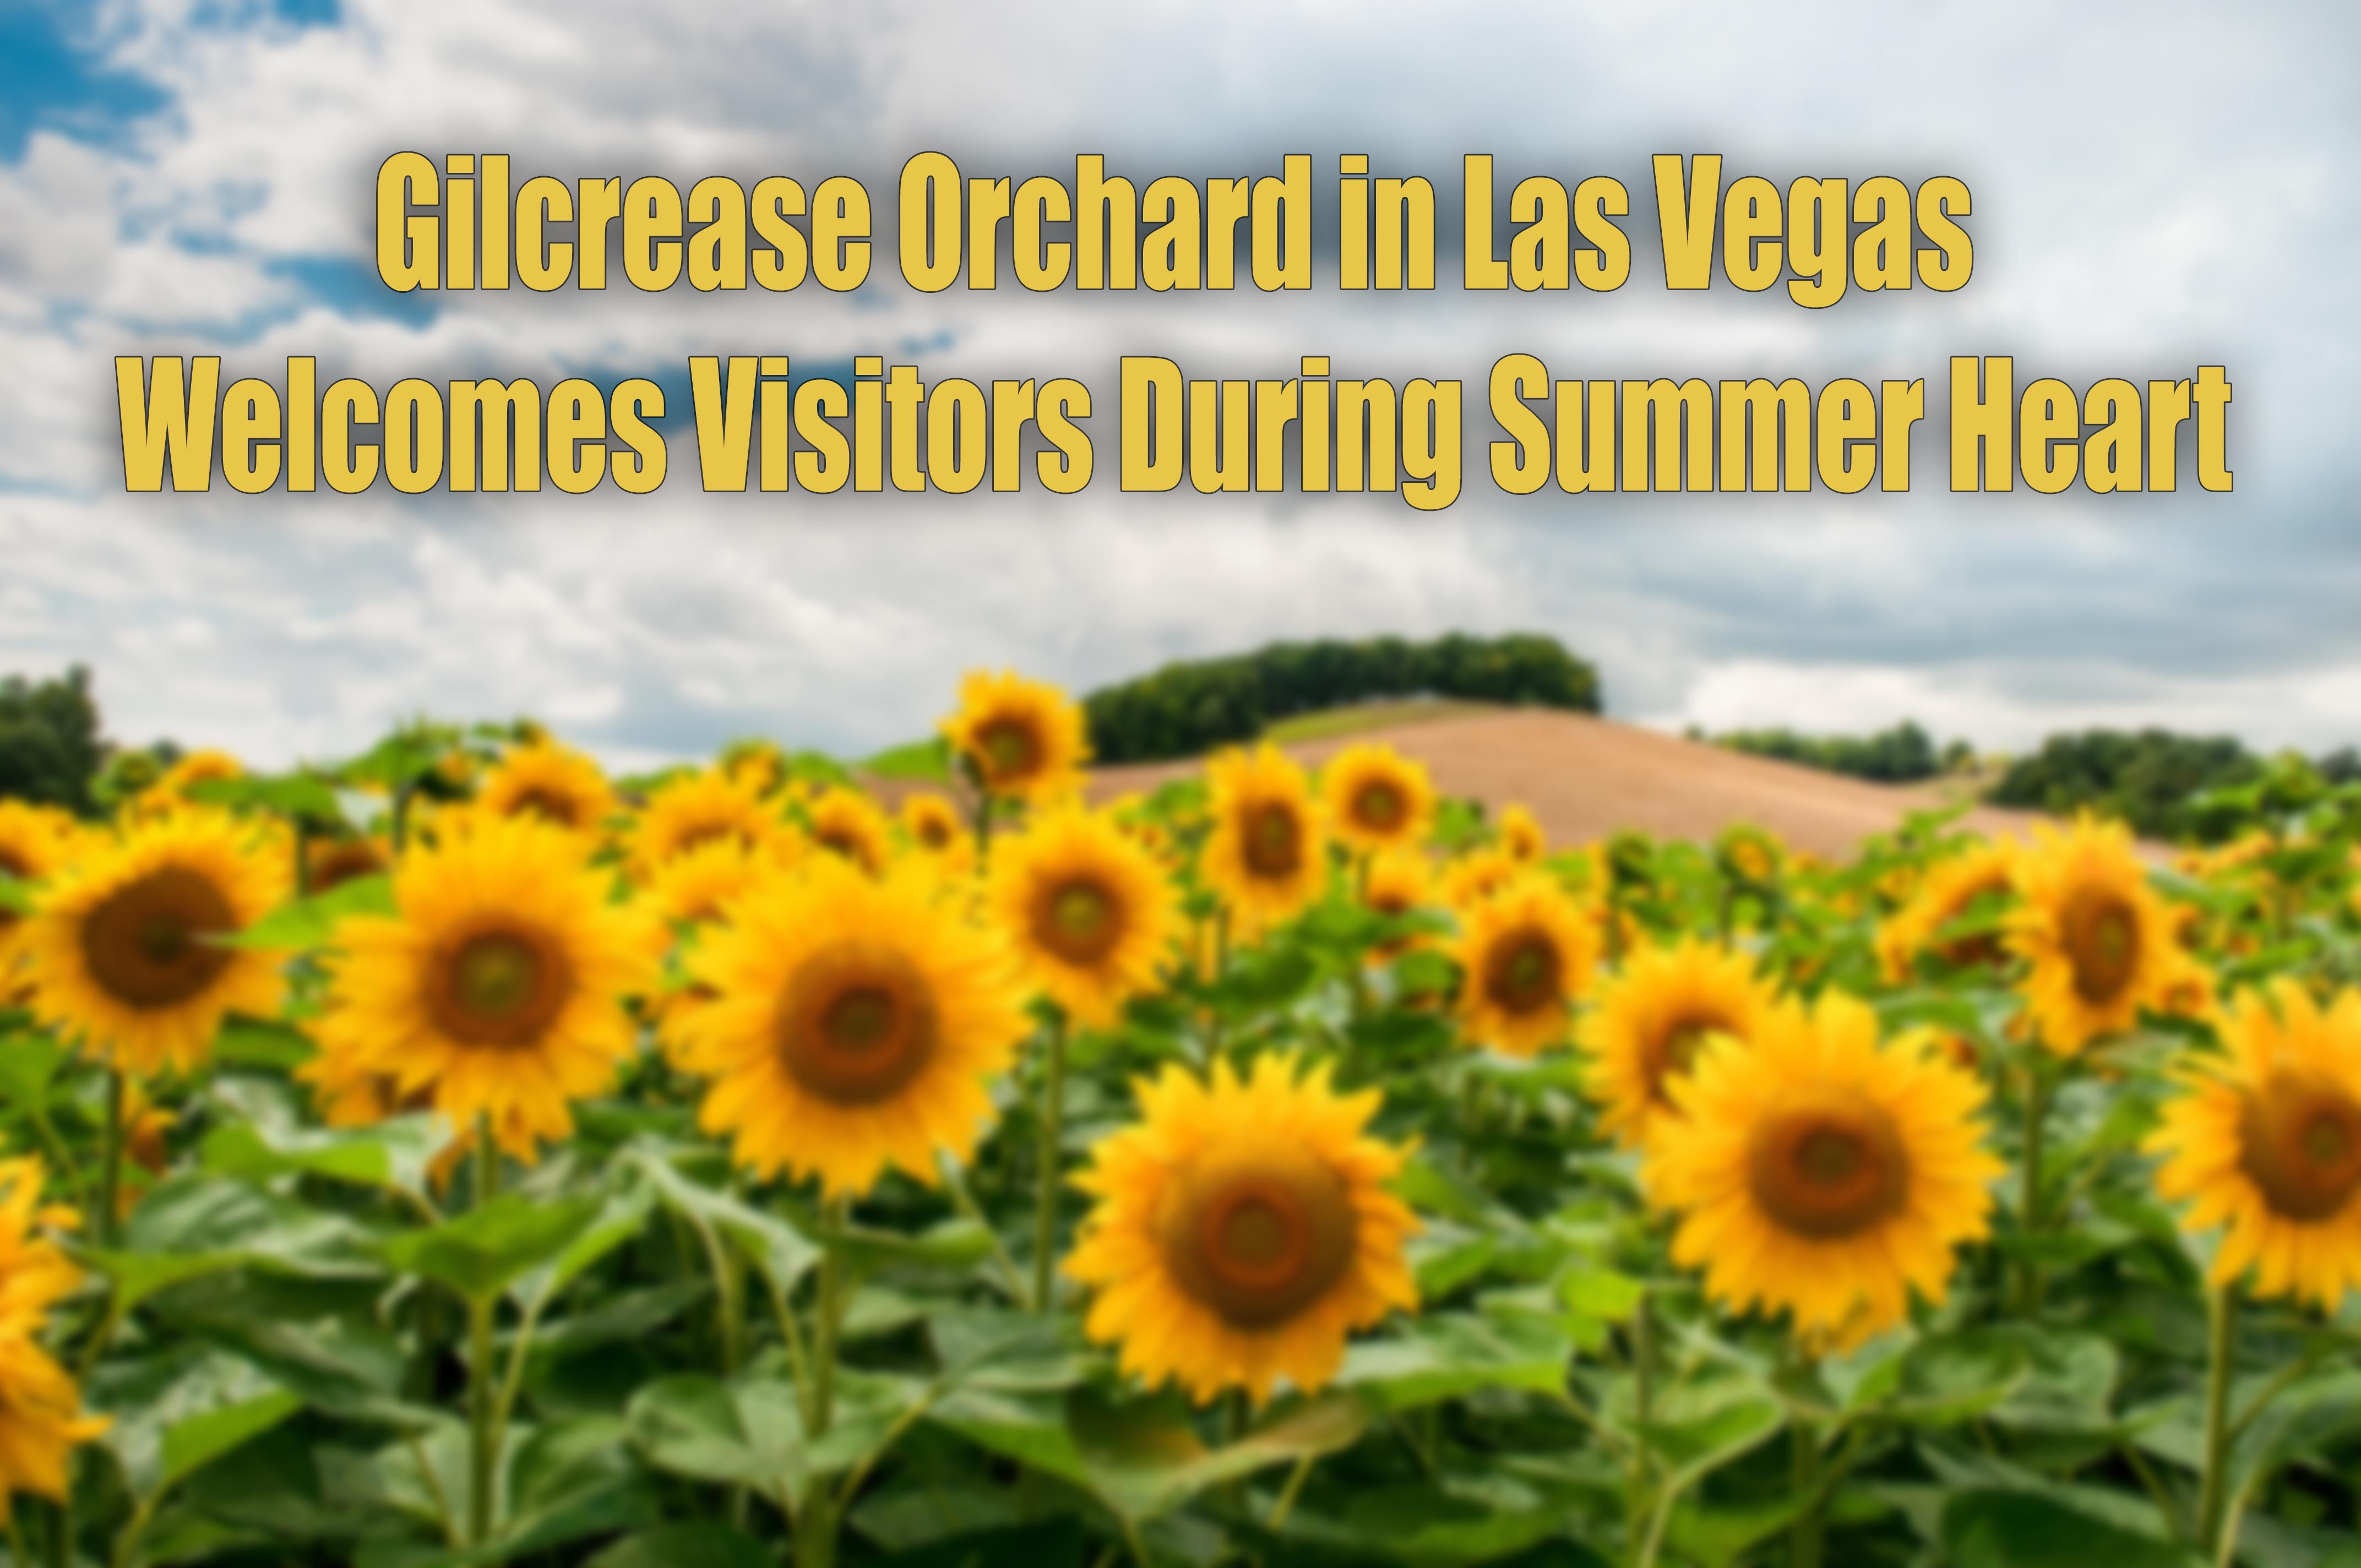 Gilcrease Orchard Las Vegas.jpg